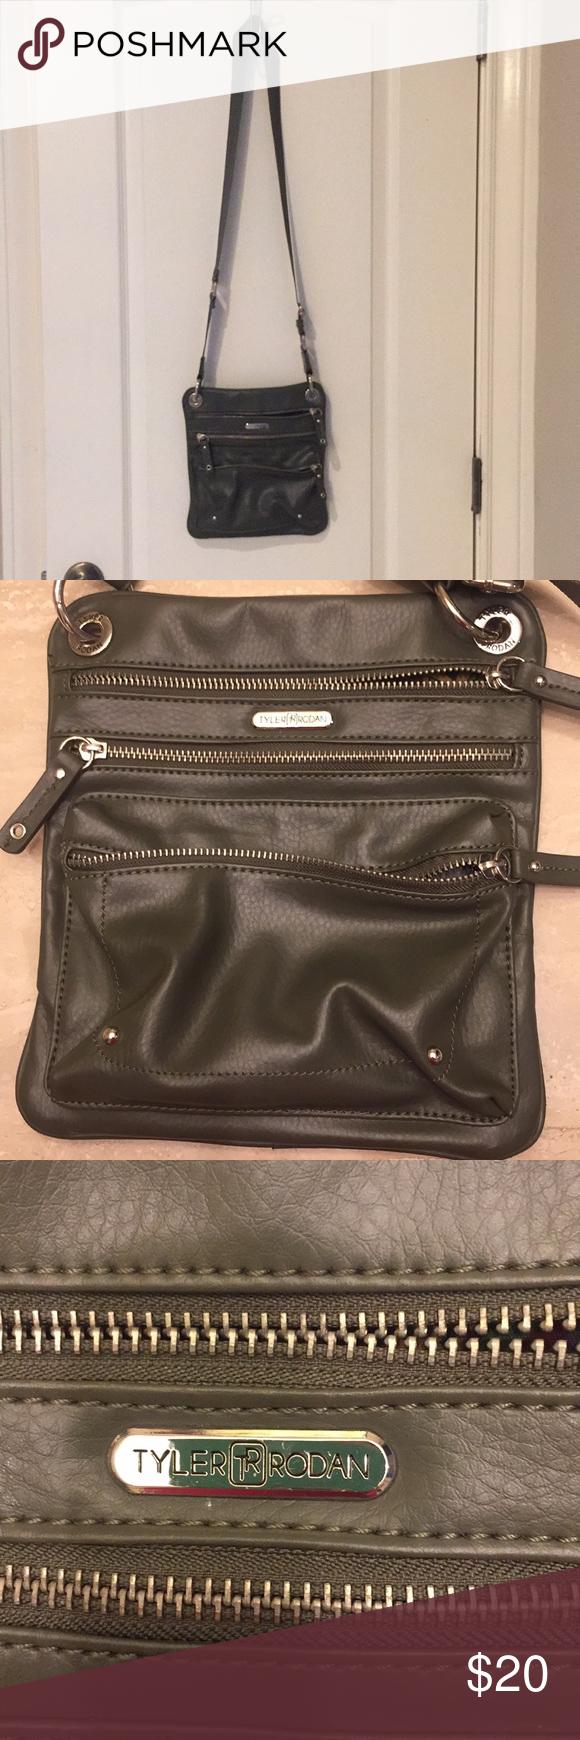 Tyler Rodan Crossbody Bag Olive Green Multiple Zippered Pockets Very Lightweight Excellent Condition Bags